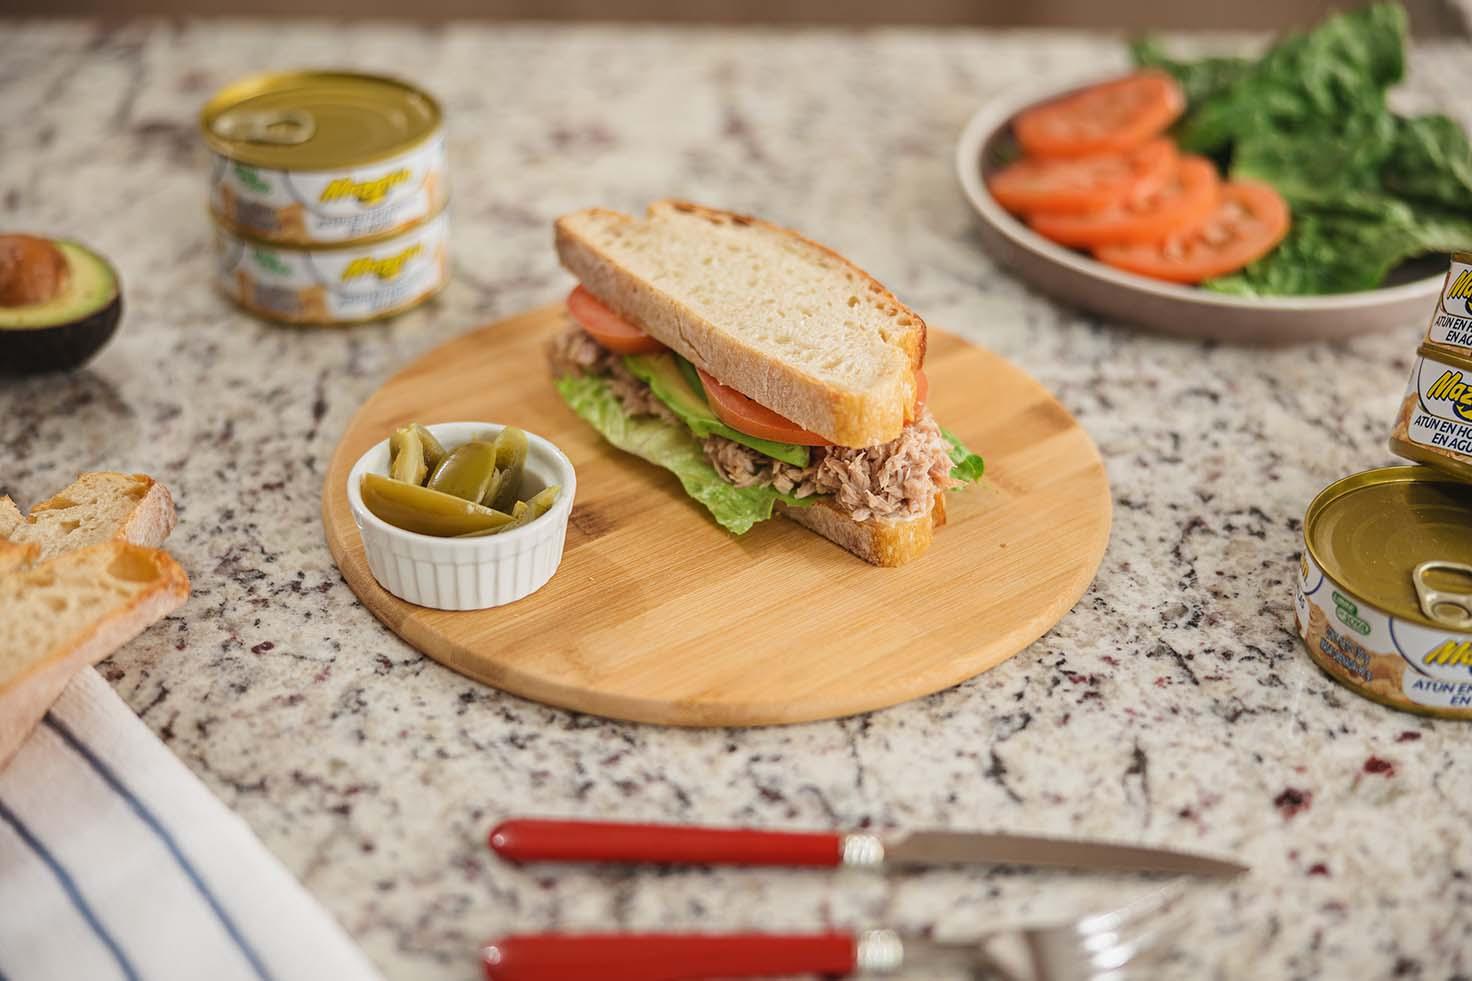 Sándwich sencillo de atún